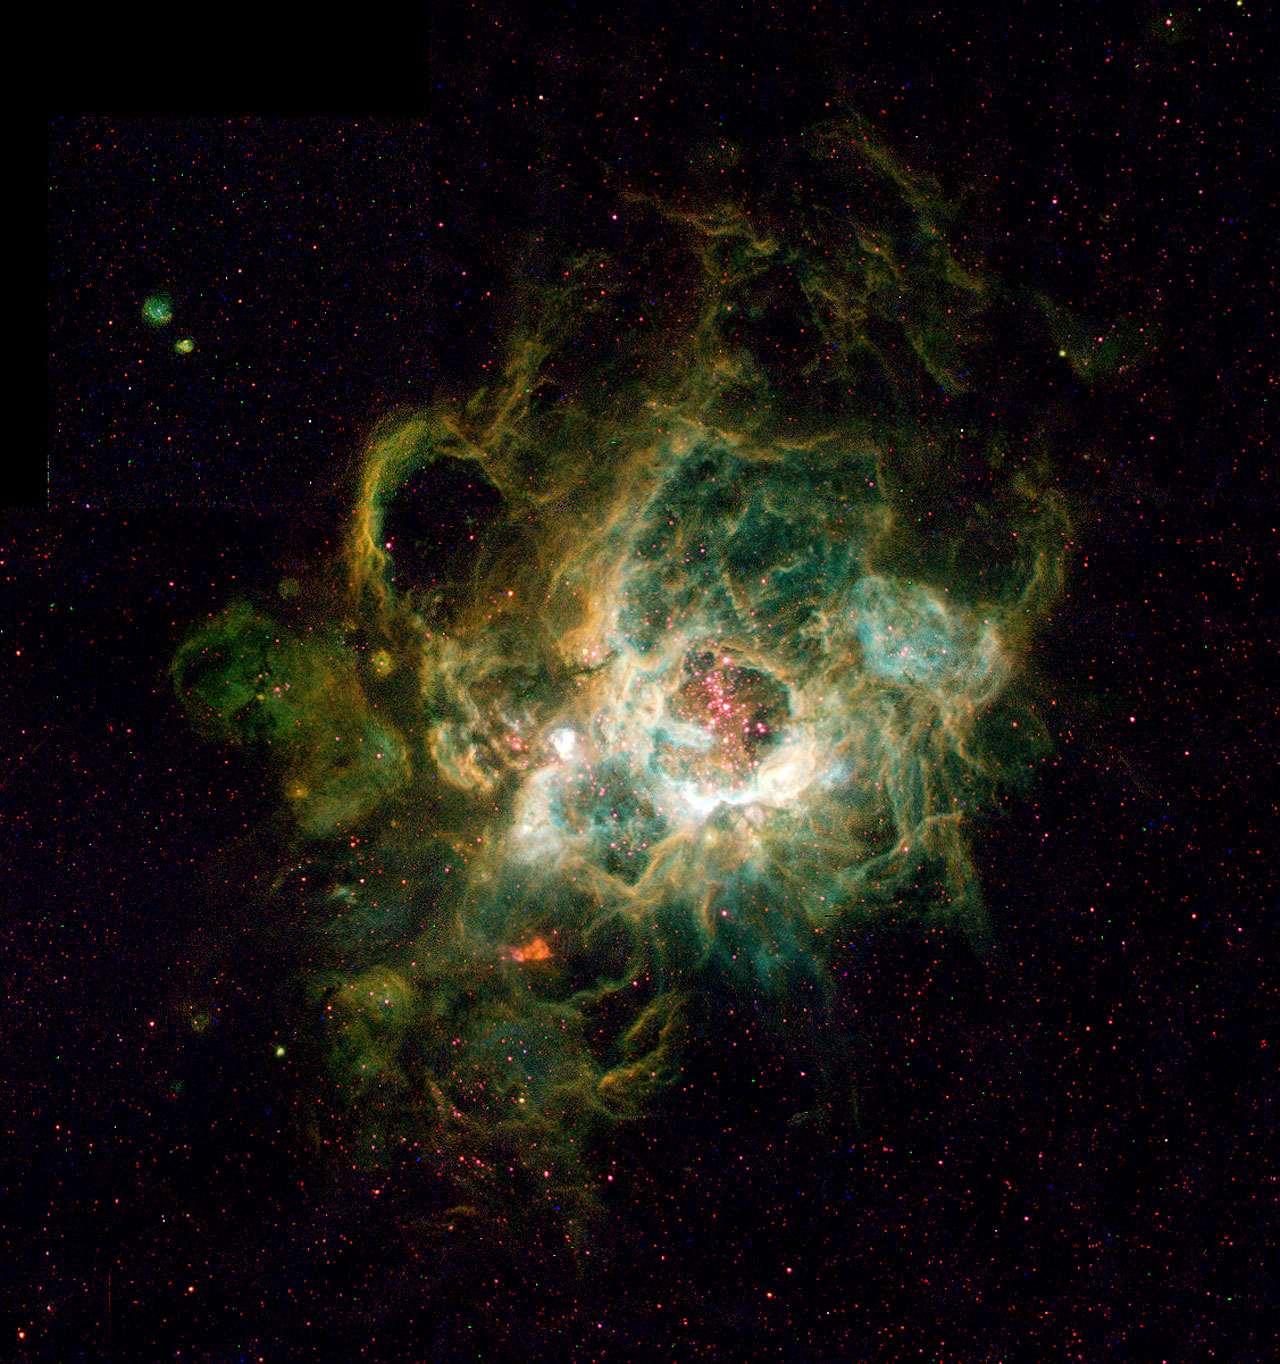 NGC 604 in Galaxy M33